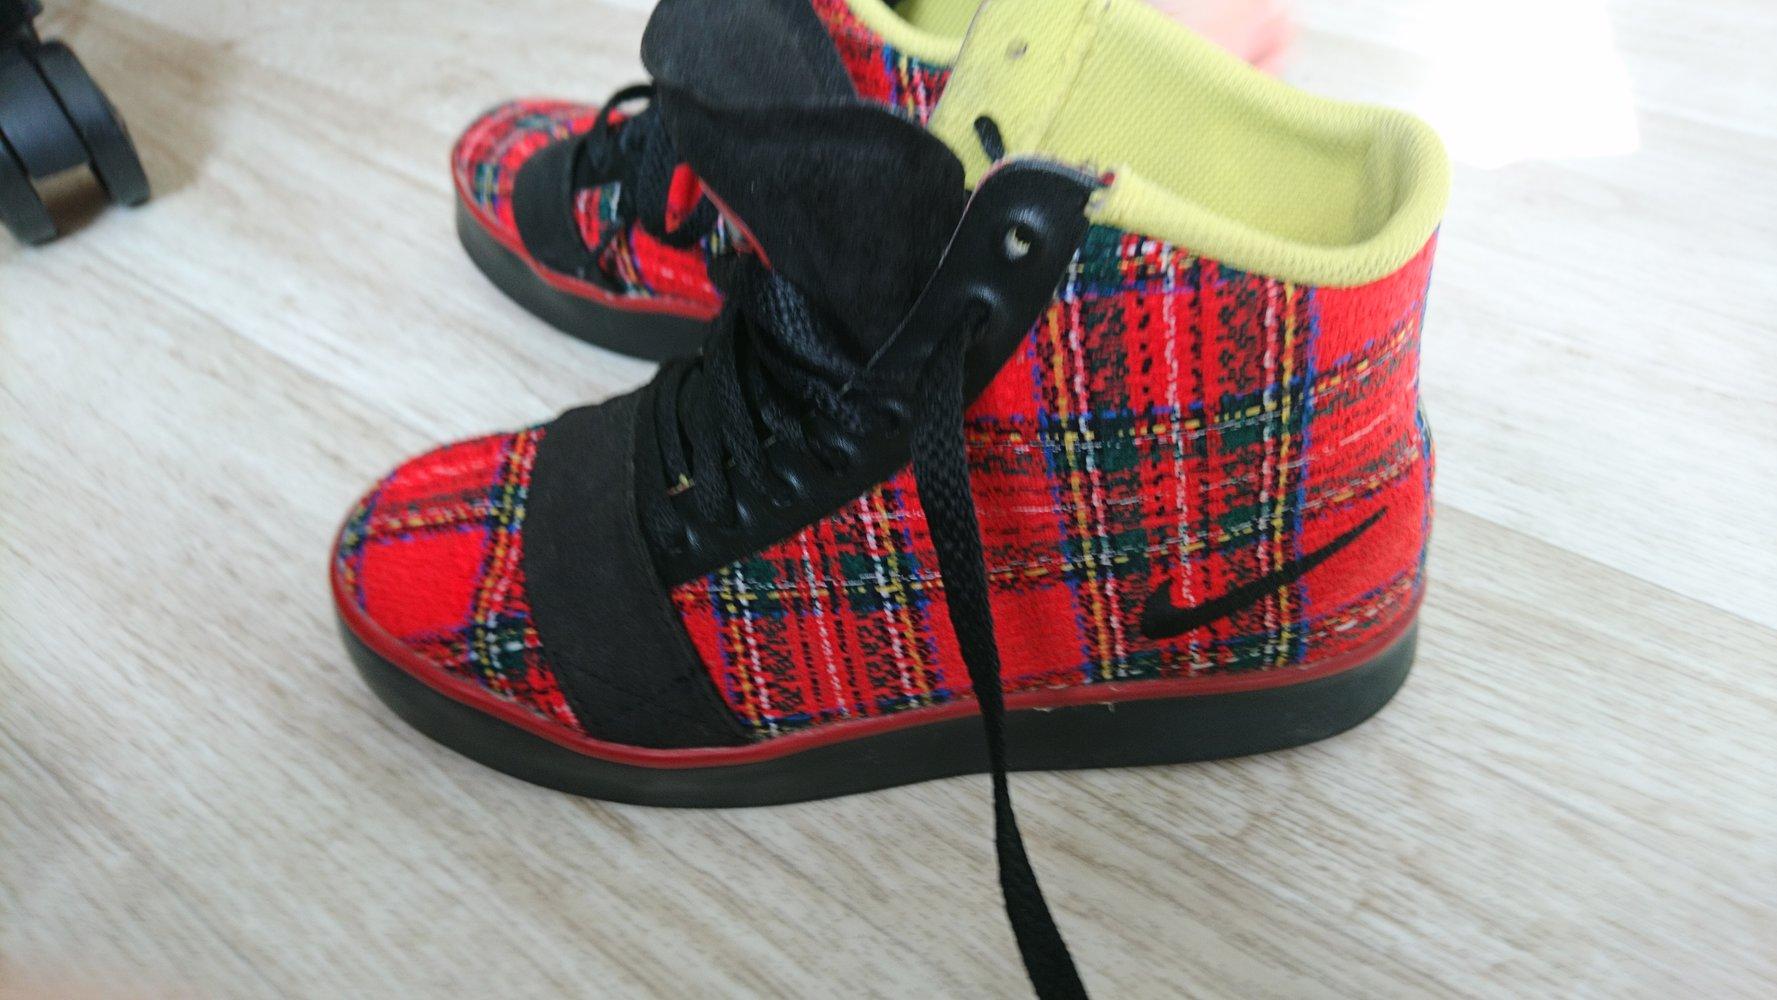 new design buy online detailed look Nike Kariert